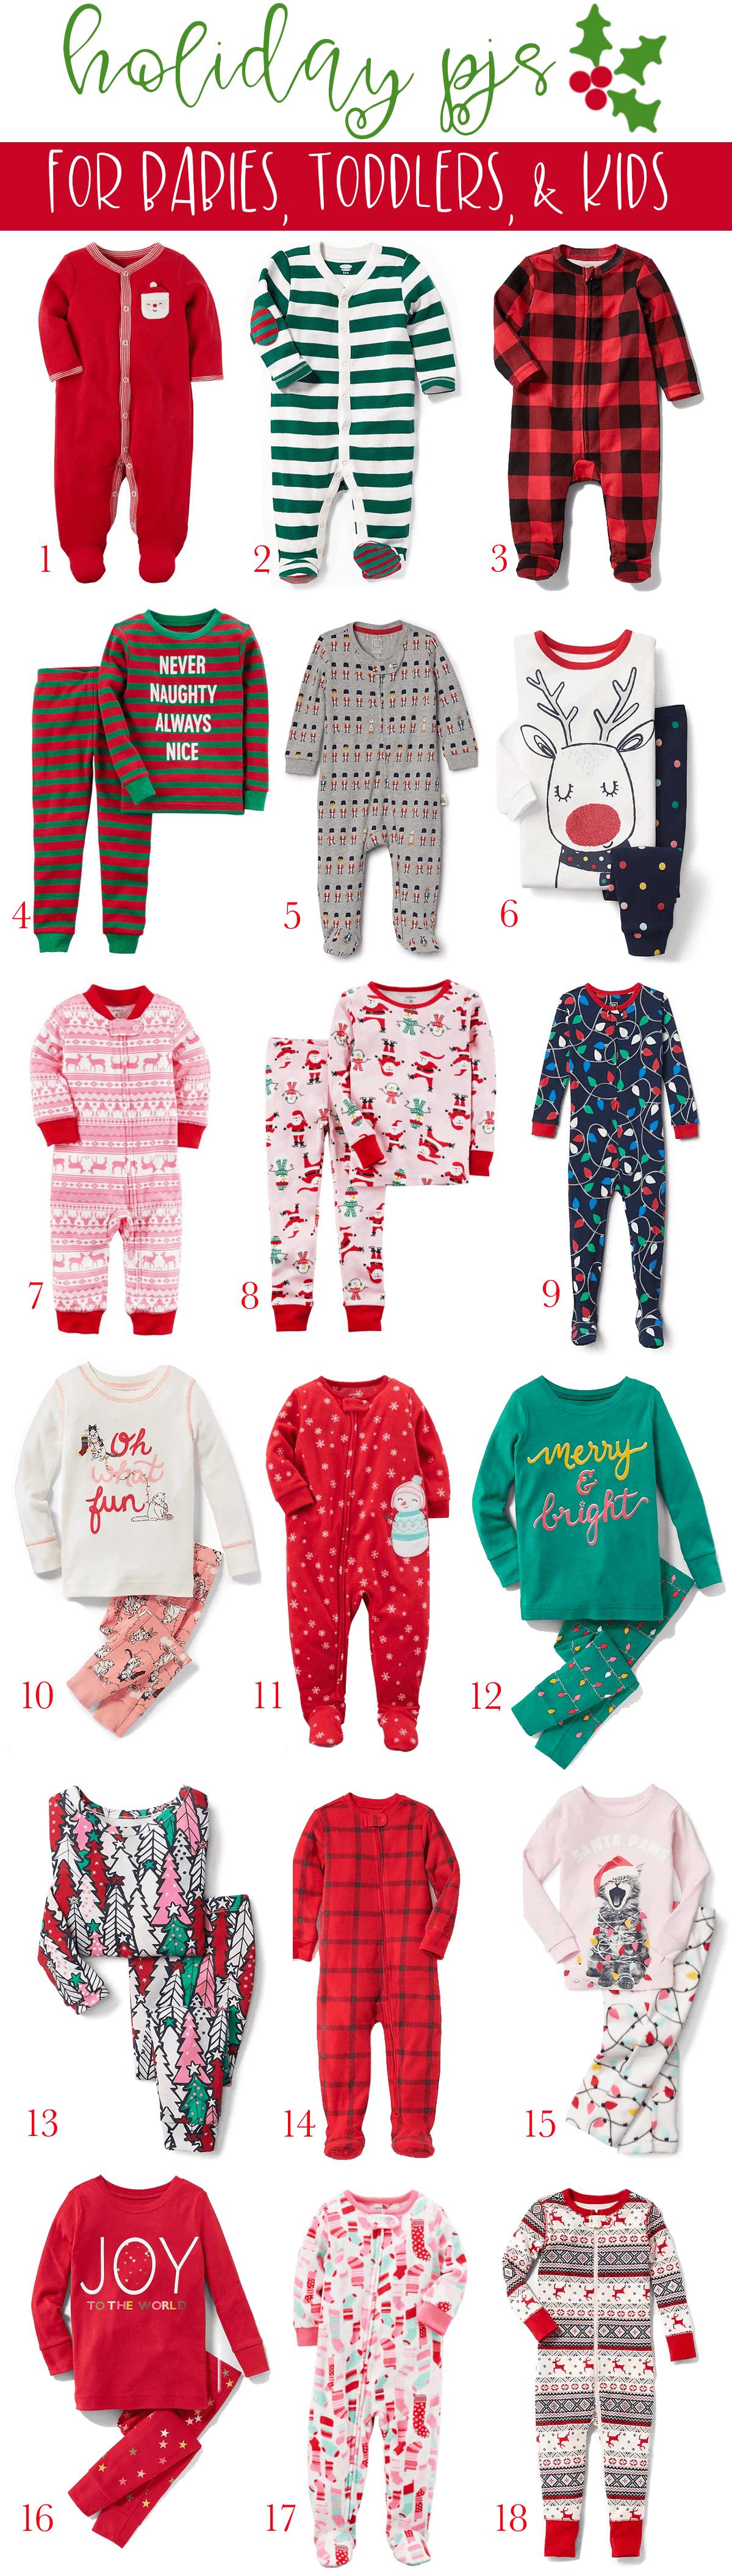 The Best Advent Calendars for Children